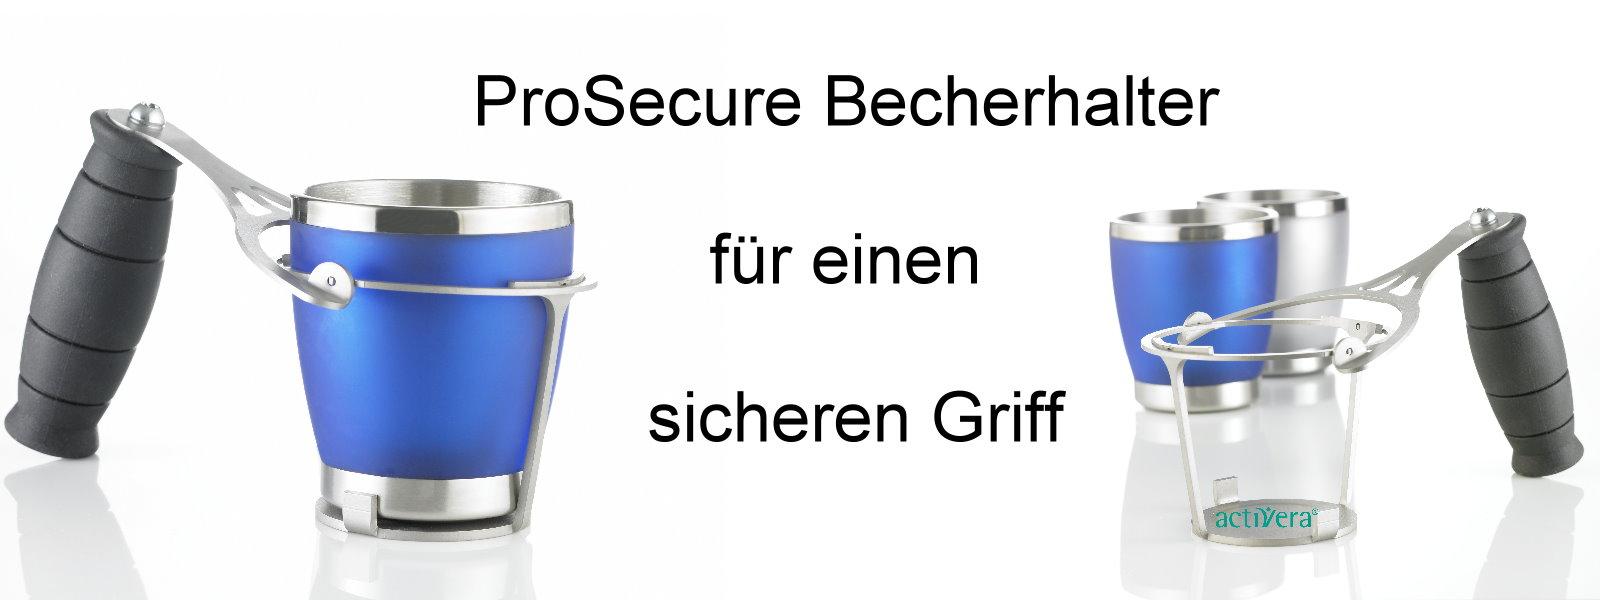 ProSecure Becherhalter